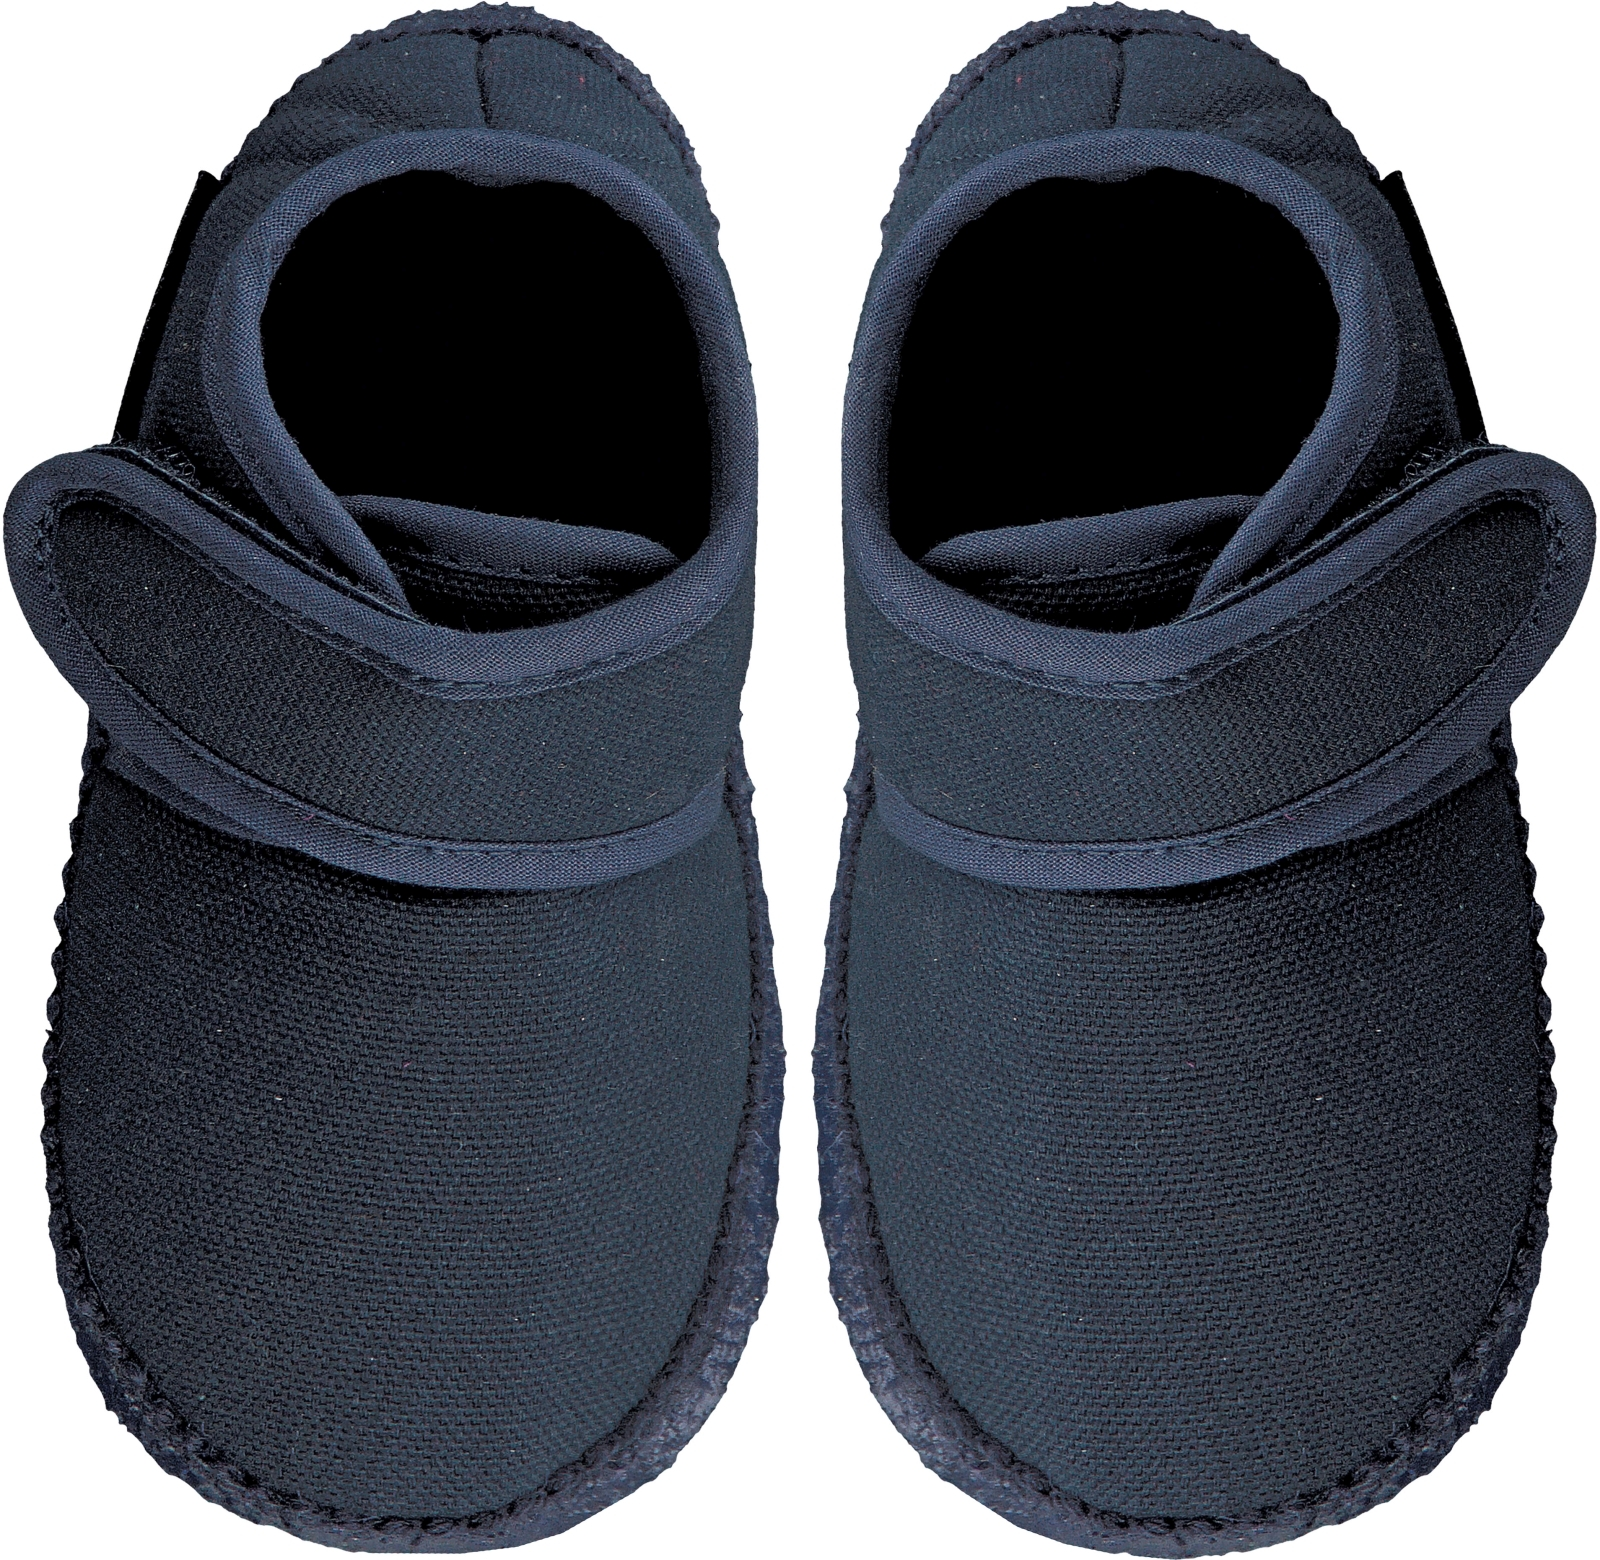 Dětské bačkůrky Nanga Luna Child - dunkelblau - Skibi Kids 825c80137d